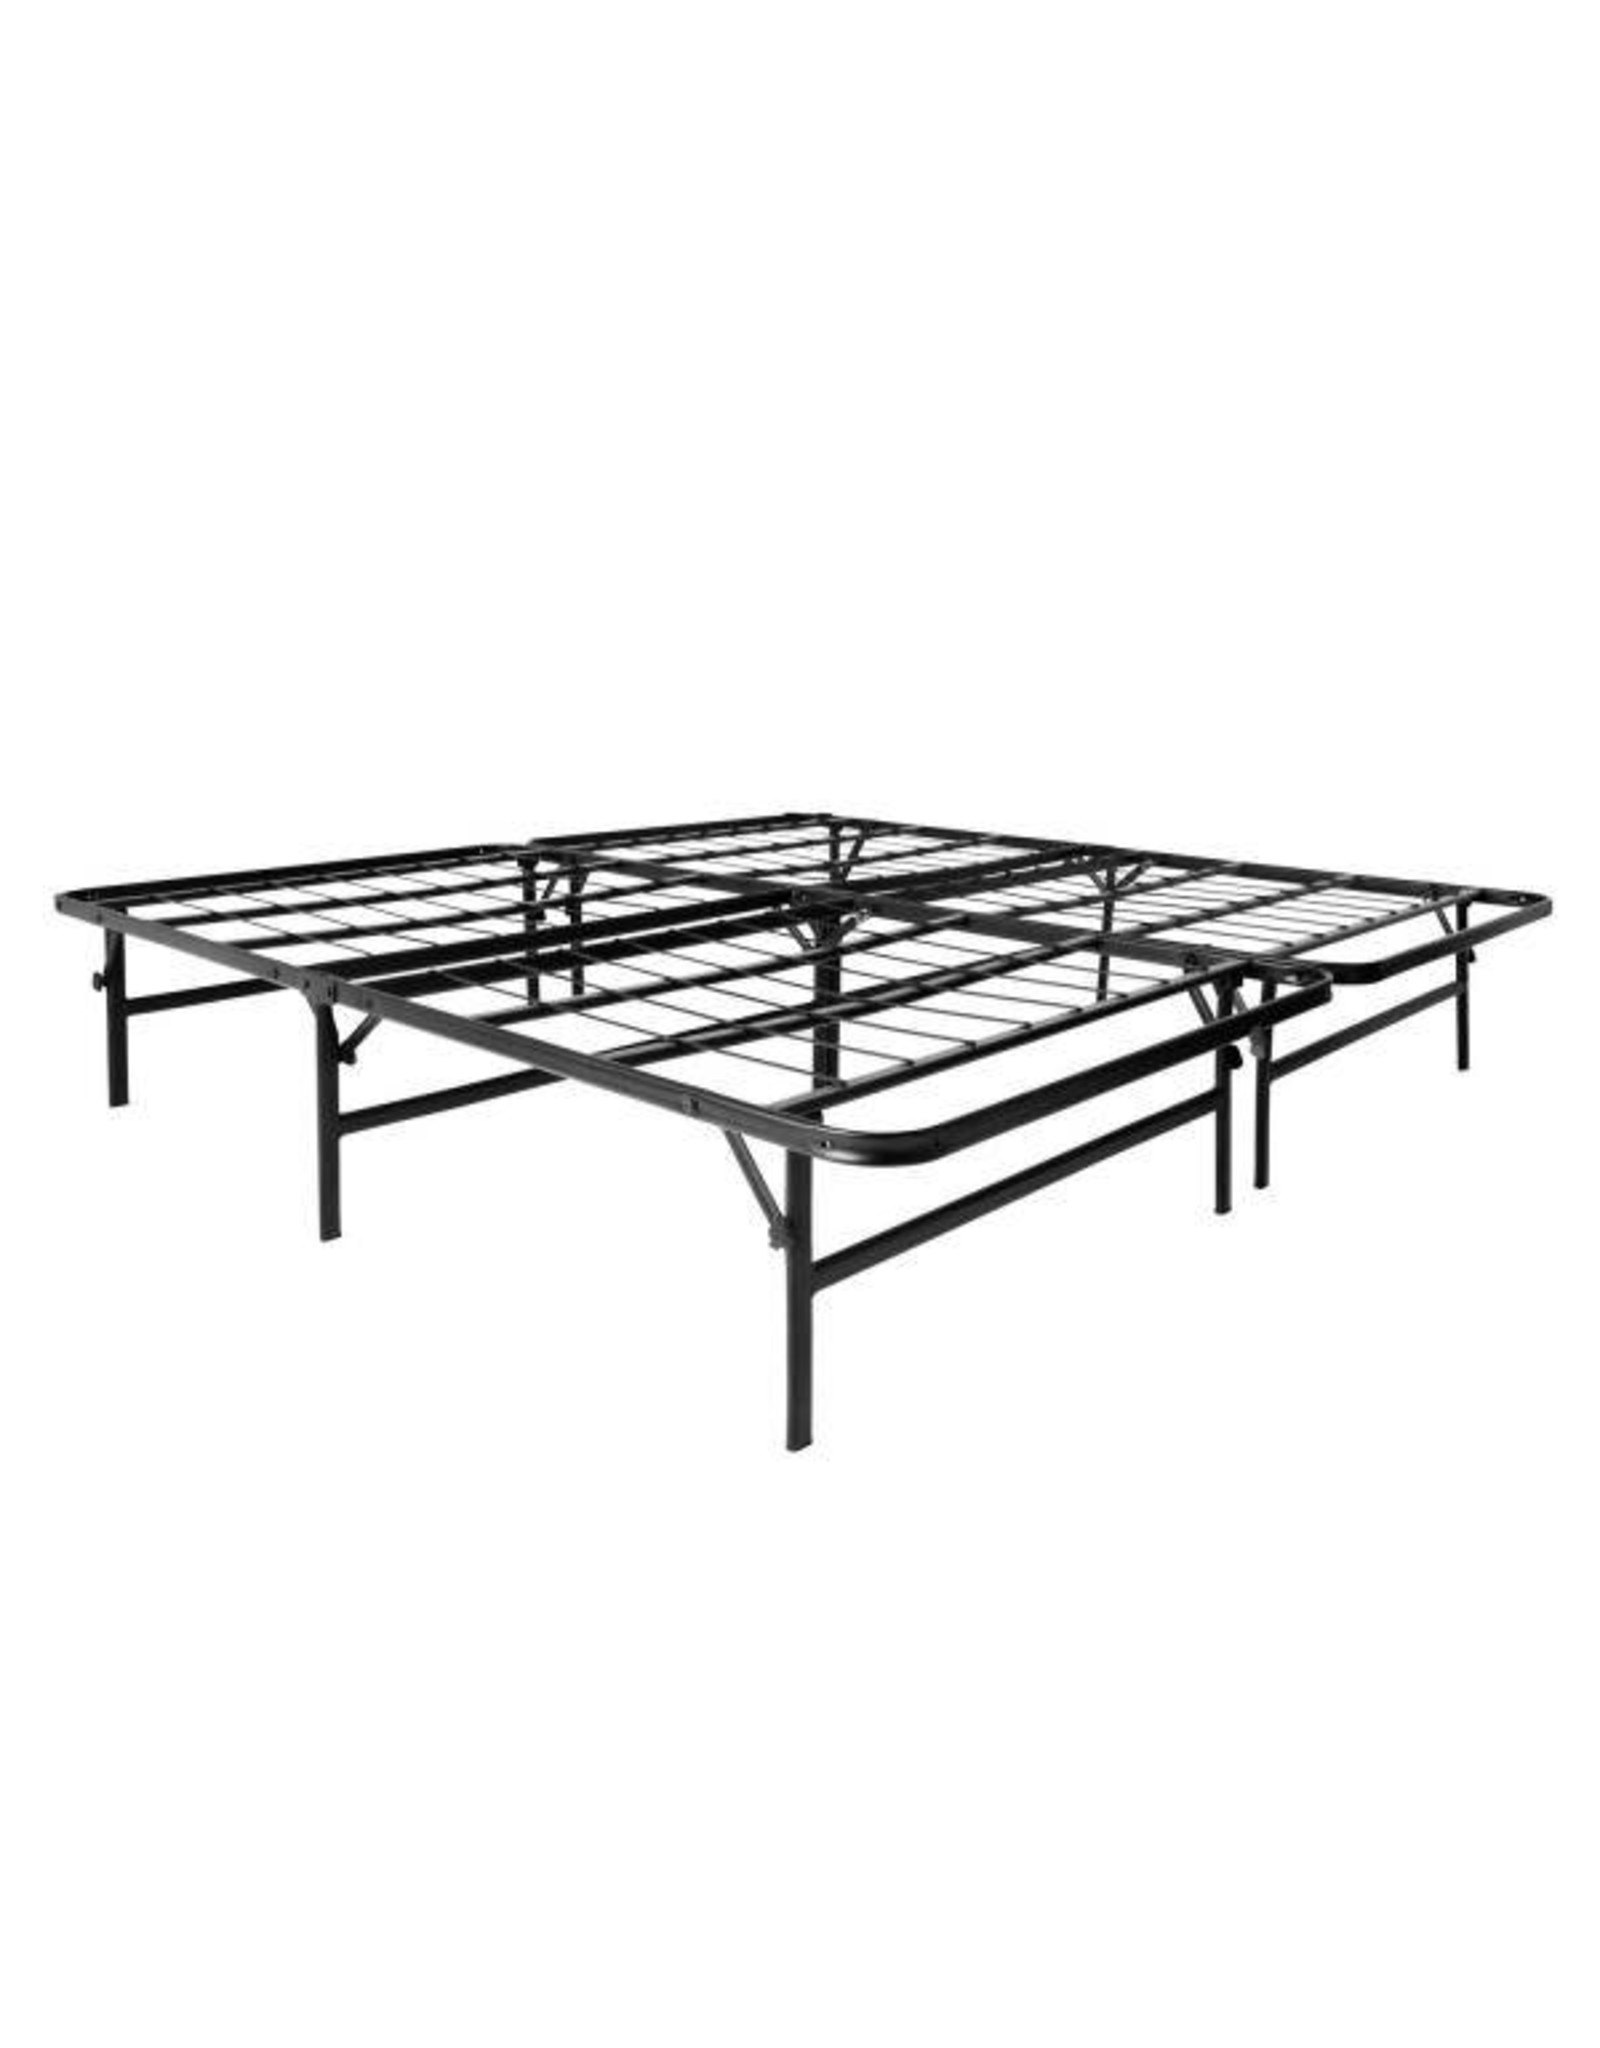 Structures ST22KKFP Bed Frame